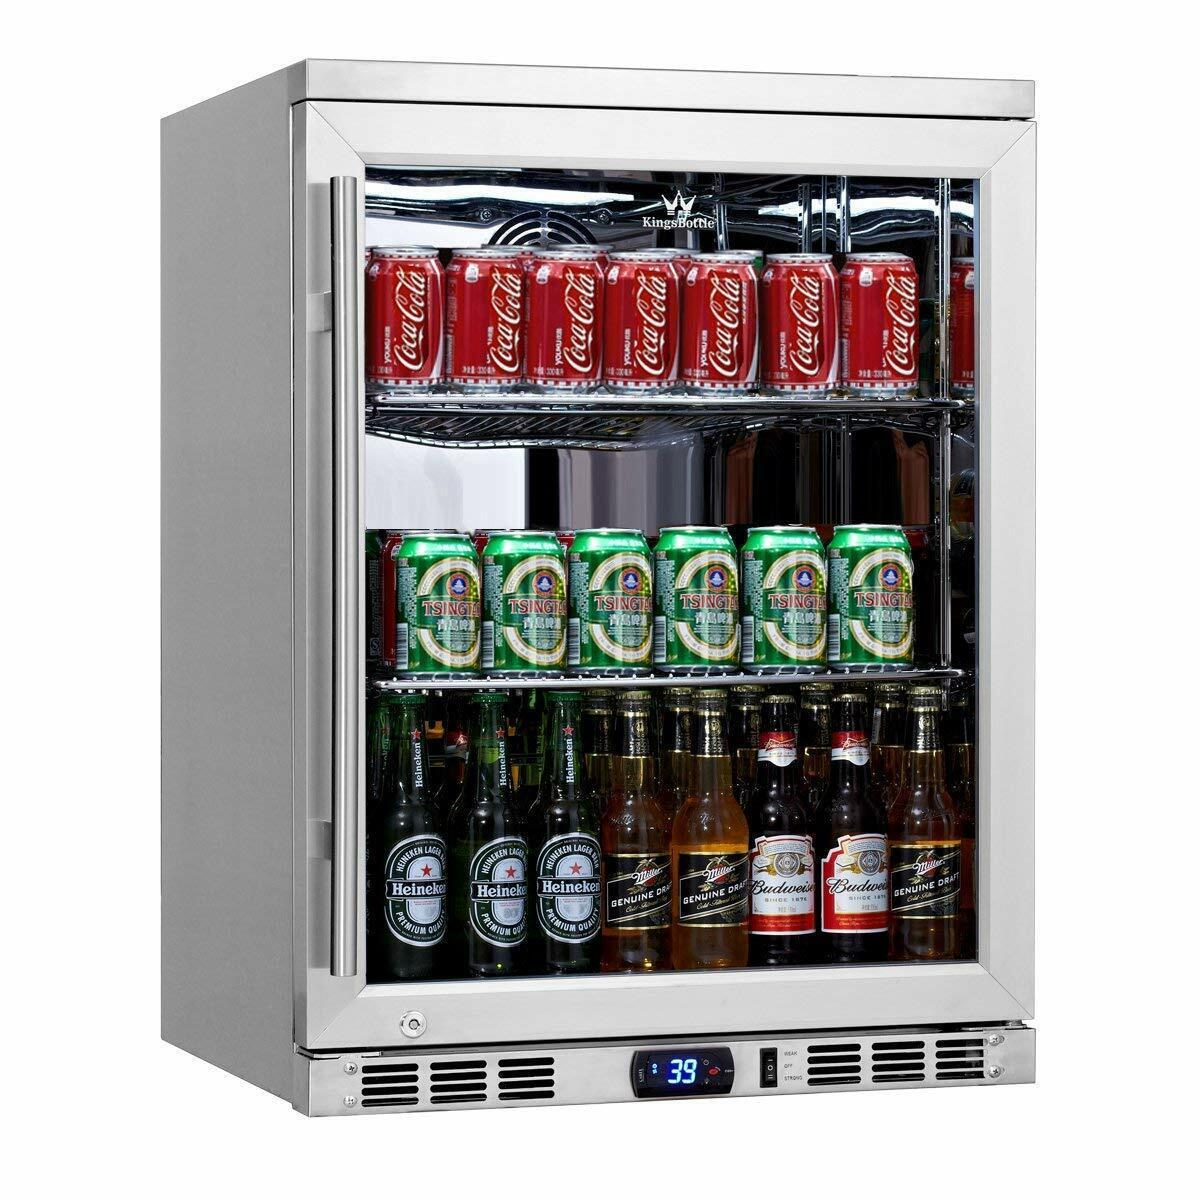 KingsBottle 140 Can 1-Door Under Counter Beverage Cooler Hea